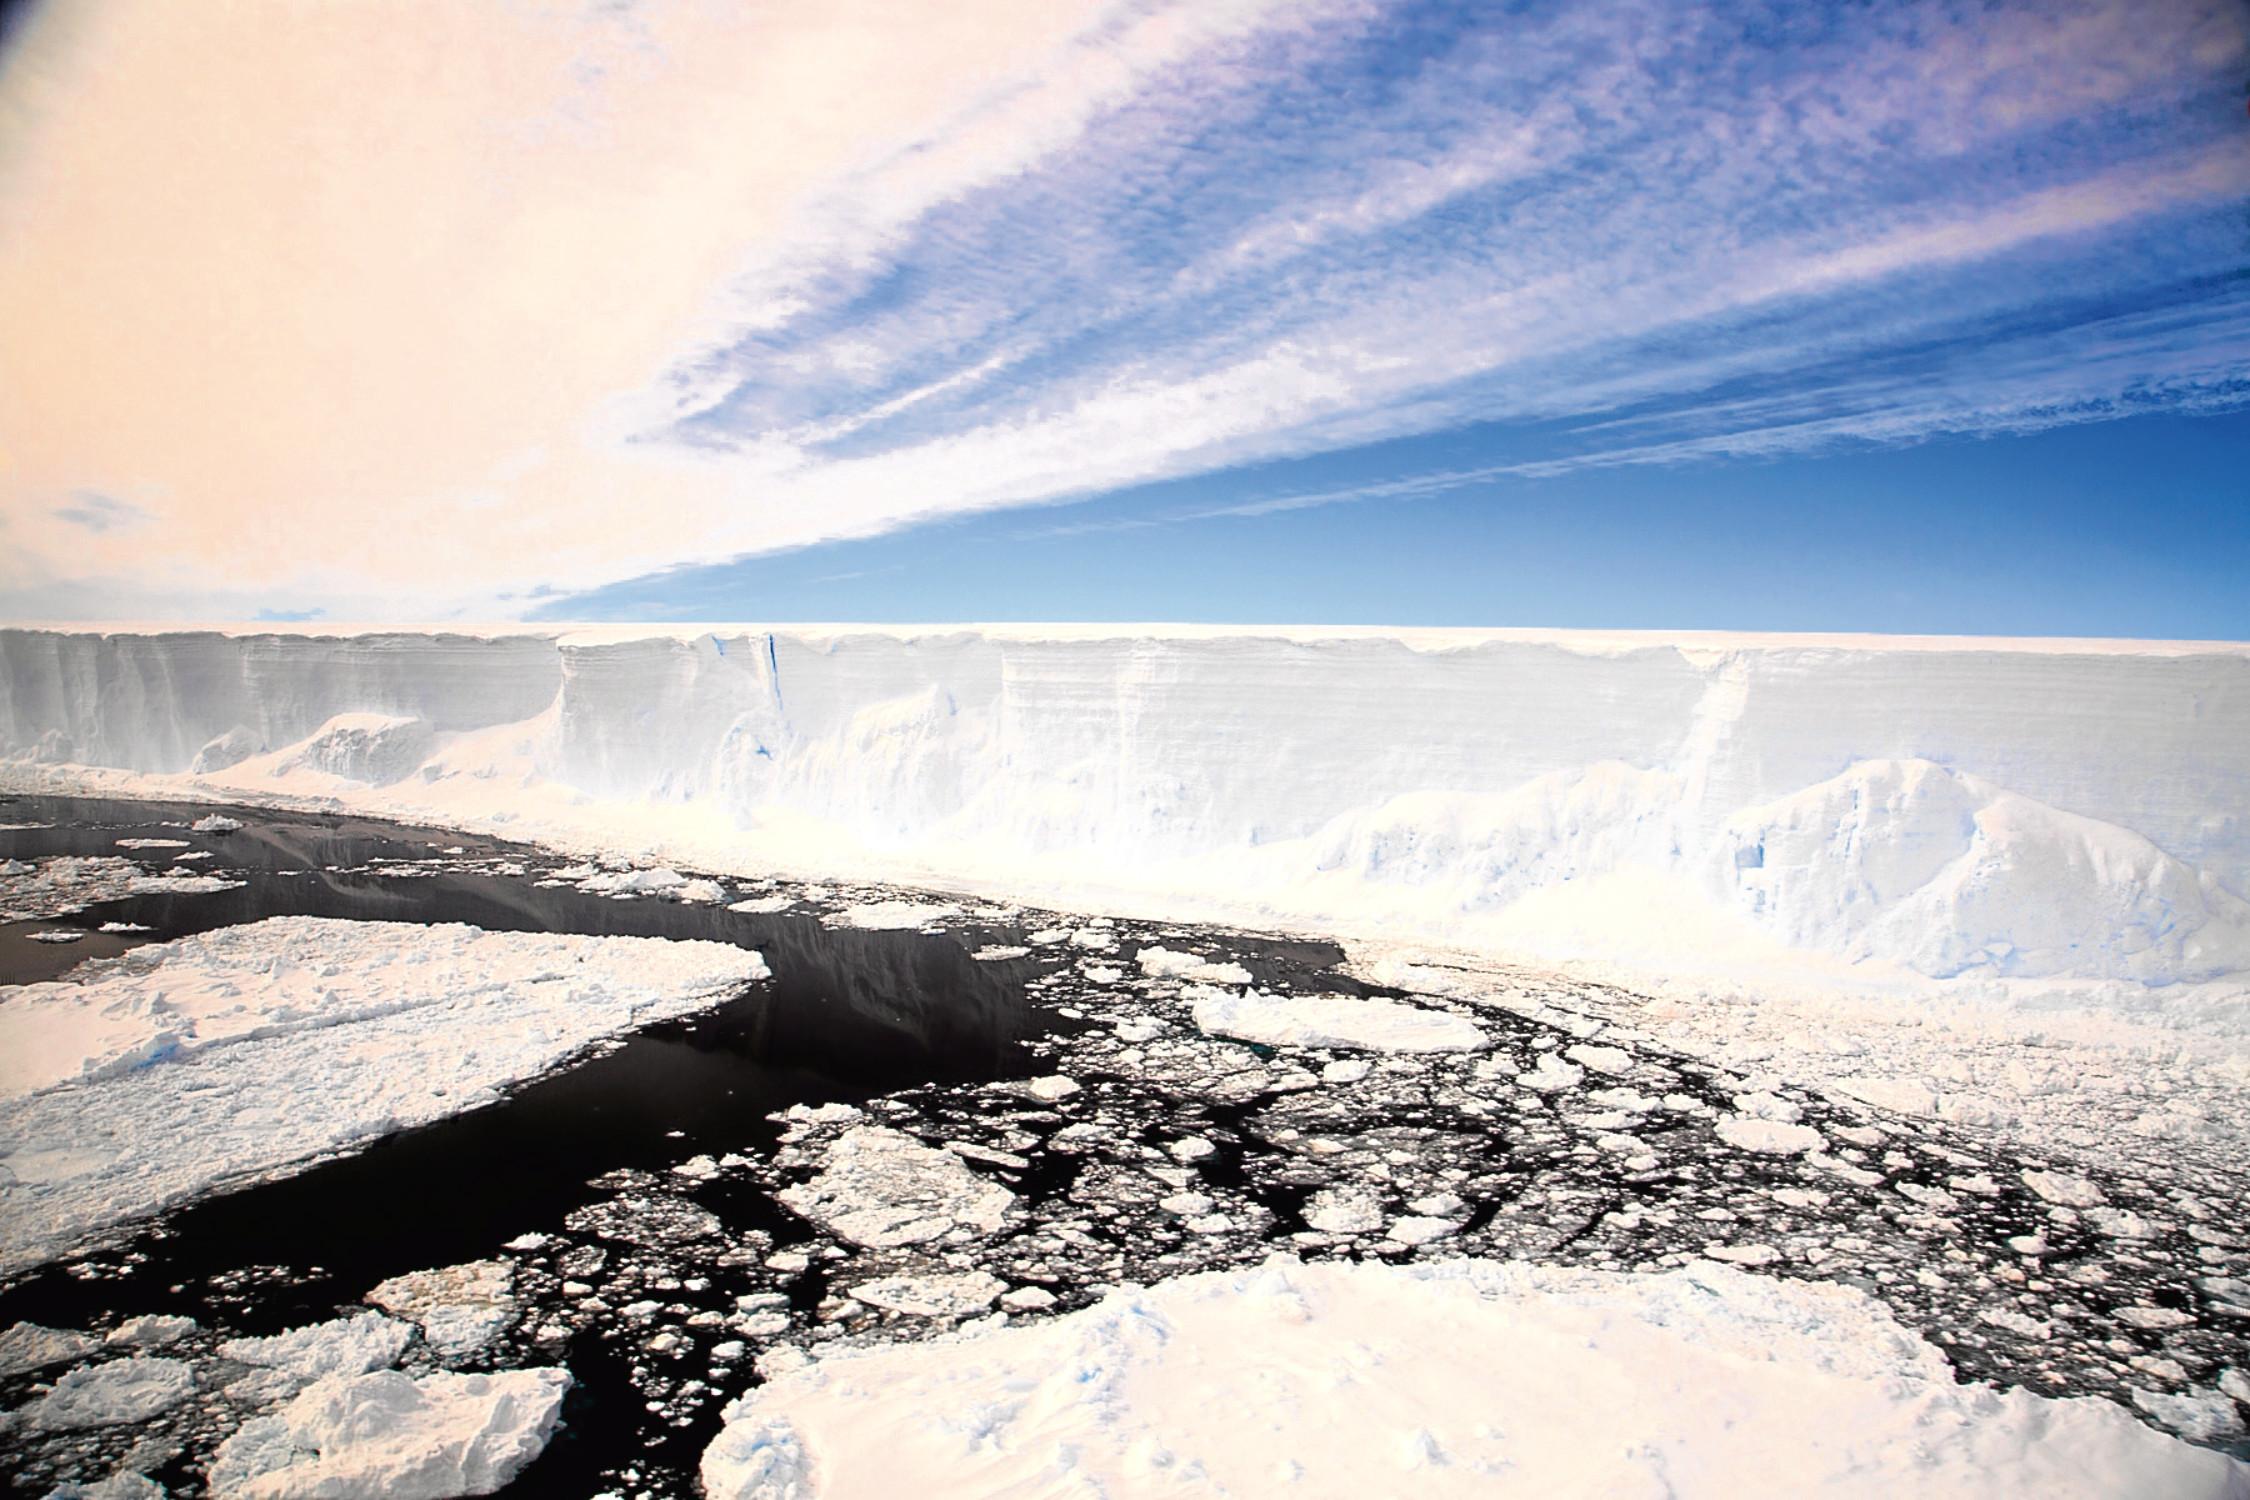 The Larsen C iceberg in Antarctica.